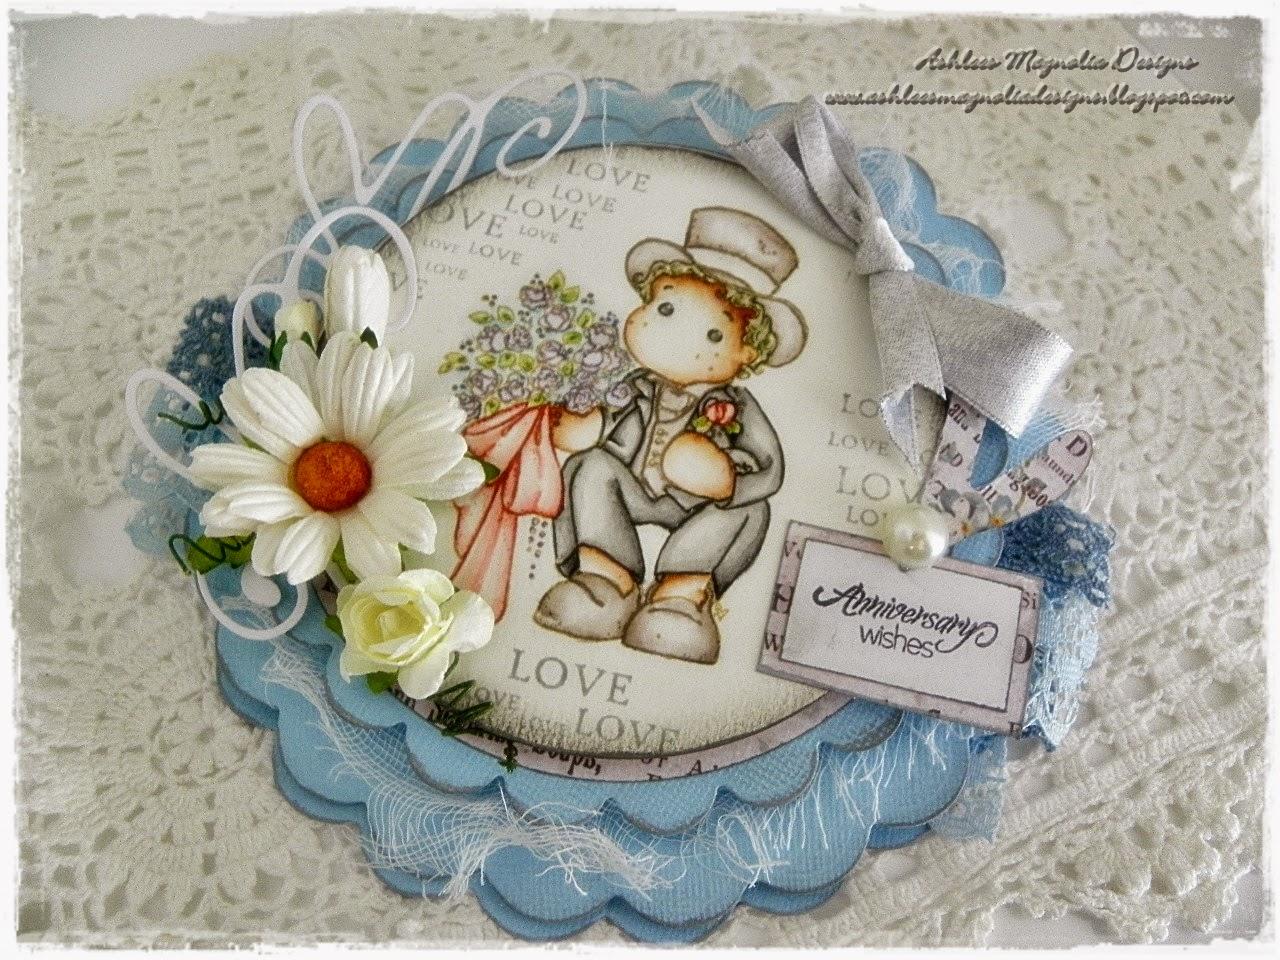 ashlees magnolia designs anniversary card featuring edwin